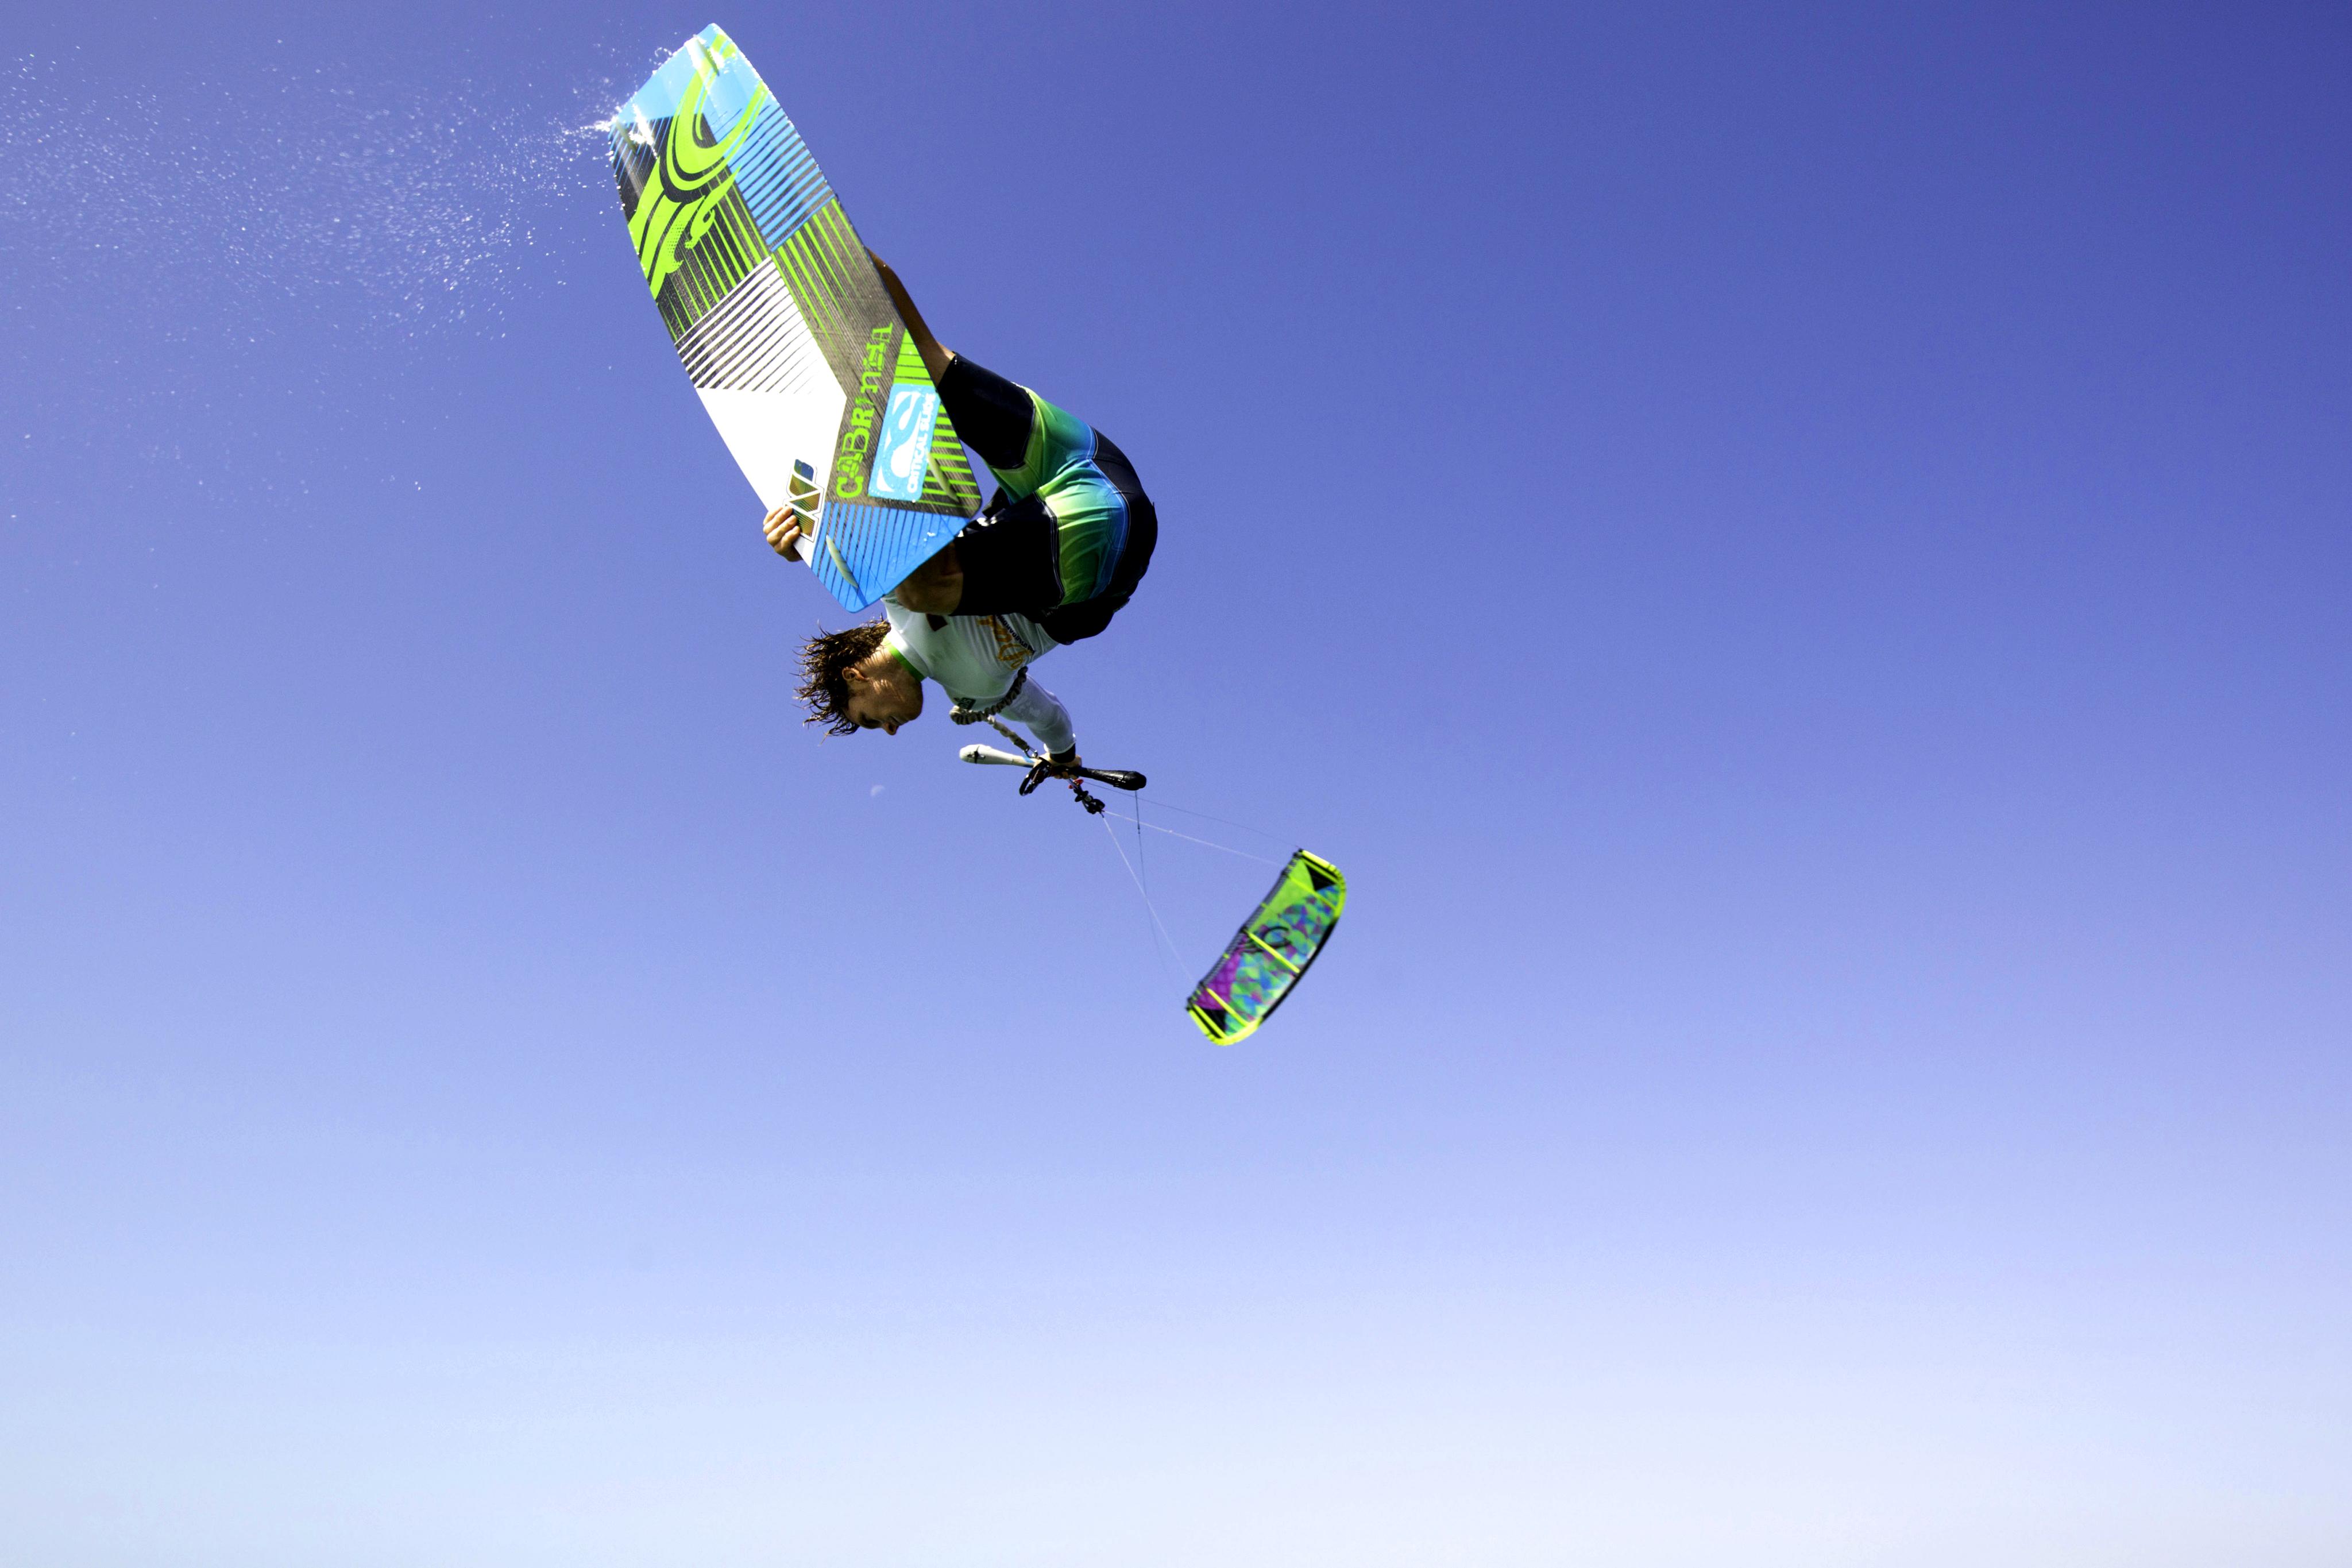 kitesurf wallpaper image - The Cabrinha Chaos kite in action - board grab kitesurfing - in resolution: Original 4095 X 2730